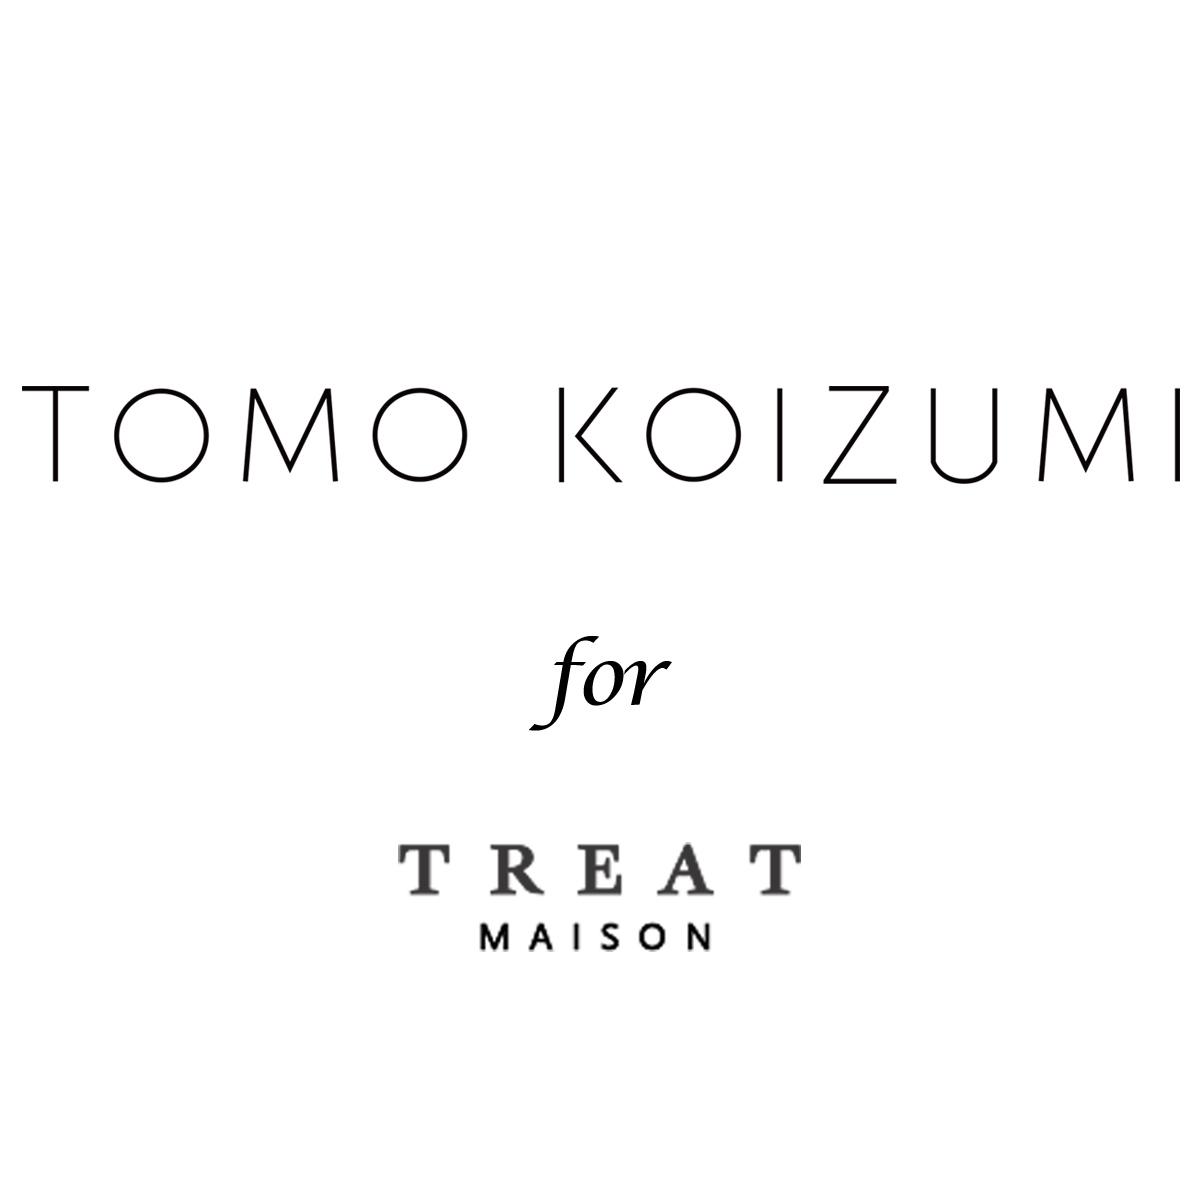 TOMO KOIZUZMI for TREAT MAISON(トモ コイズミ フォー トリート メゾン)